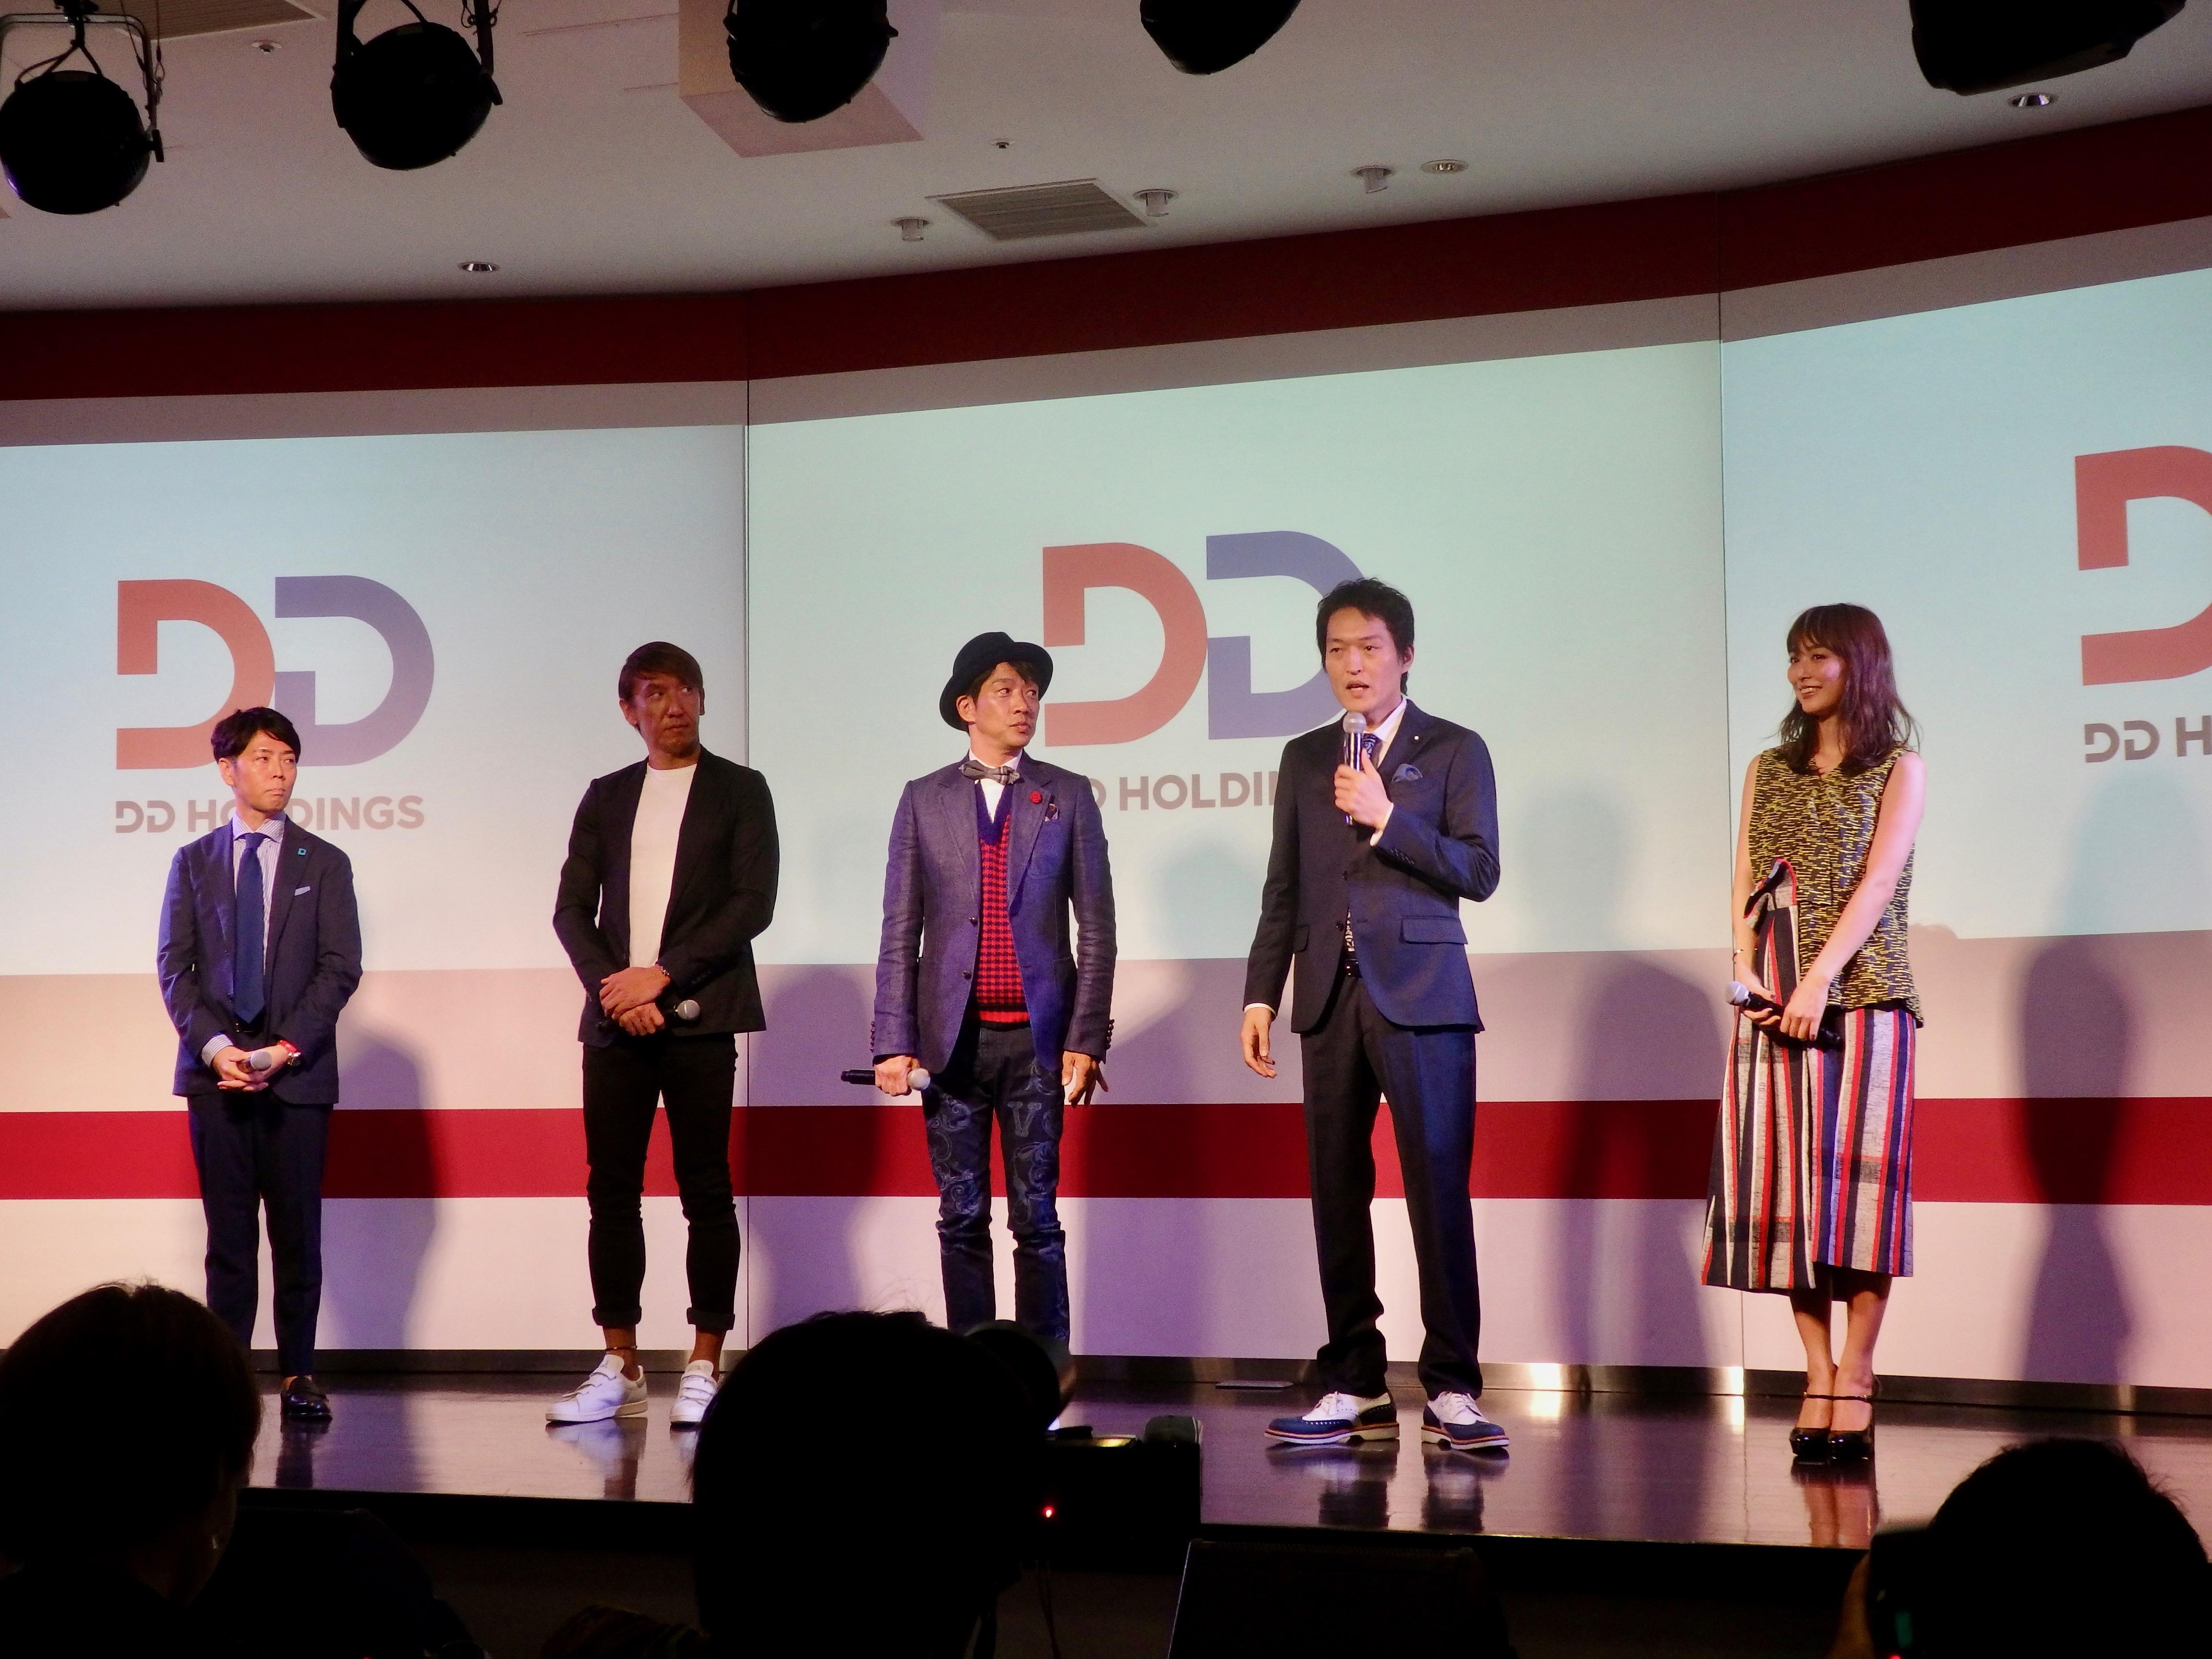 http://news.yoshimoto.co.jp/20170831234949-d6eddf007756ea43644f2d34203eaadd8e7c6c1c.jpg